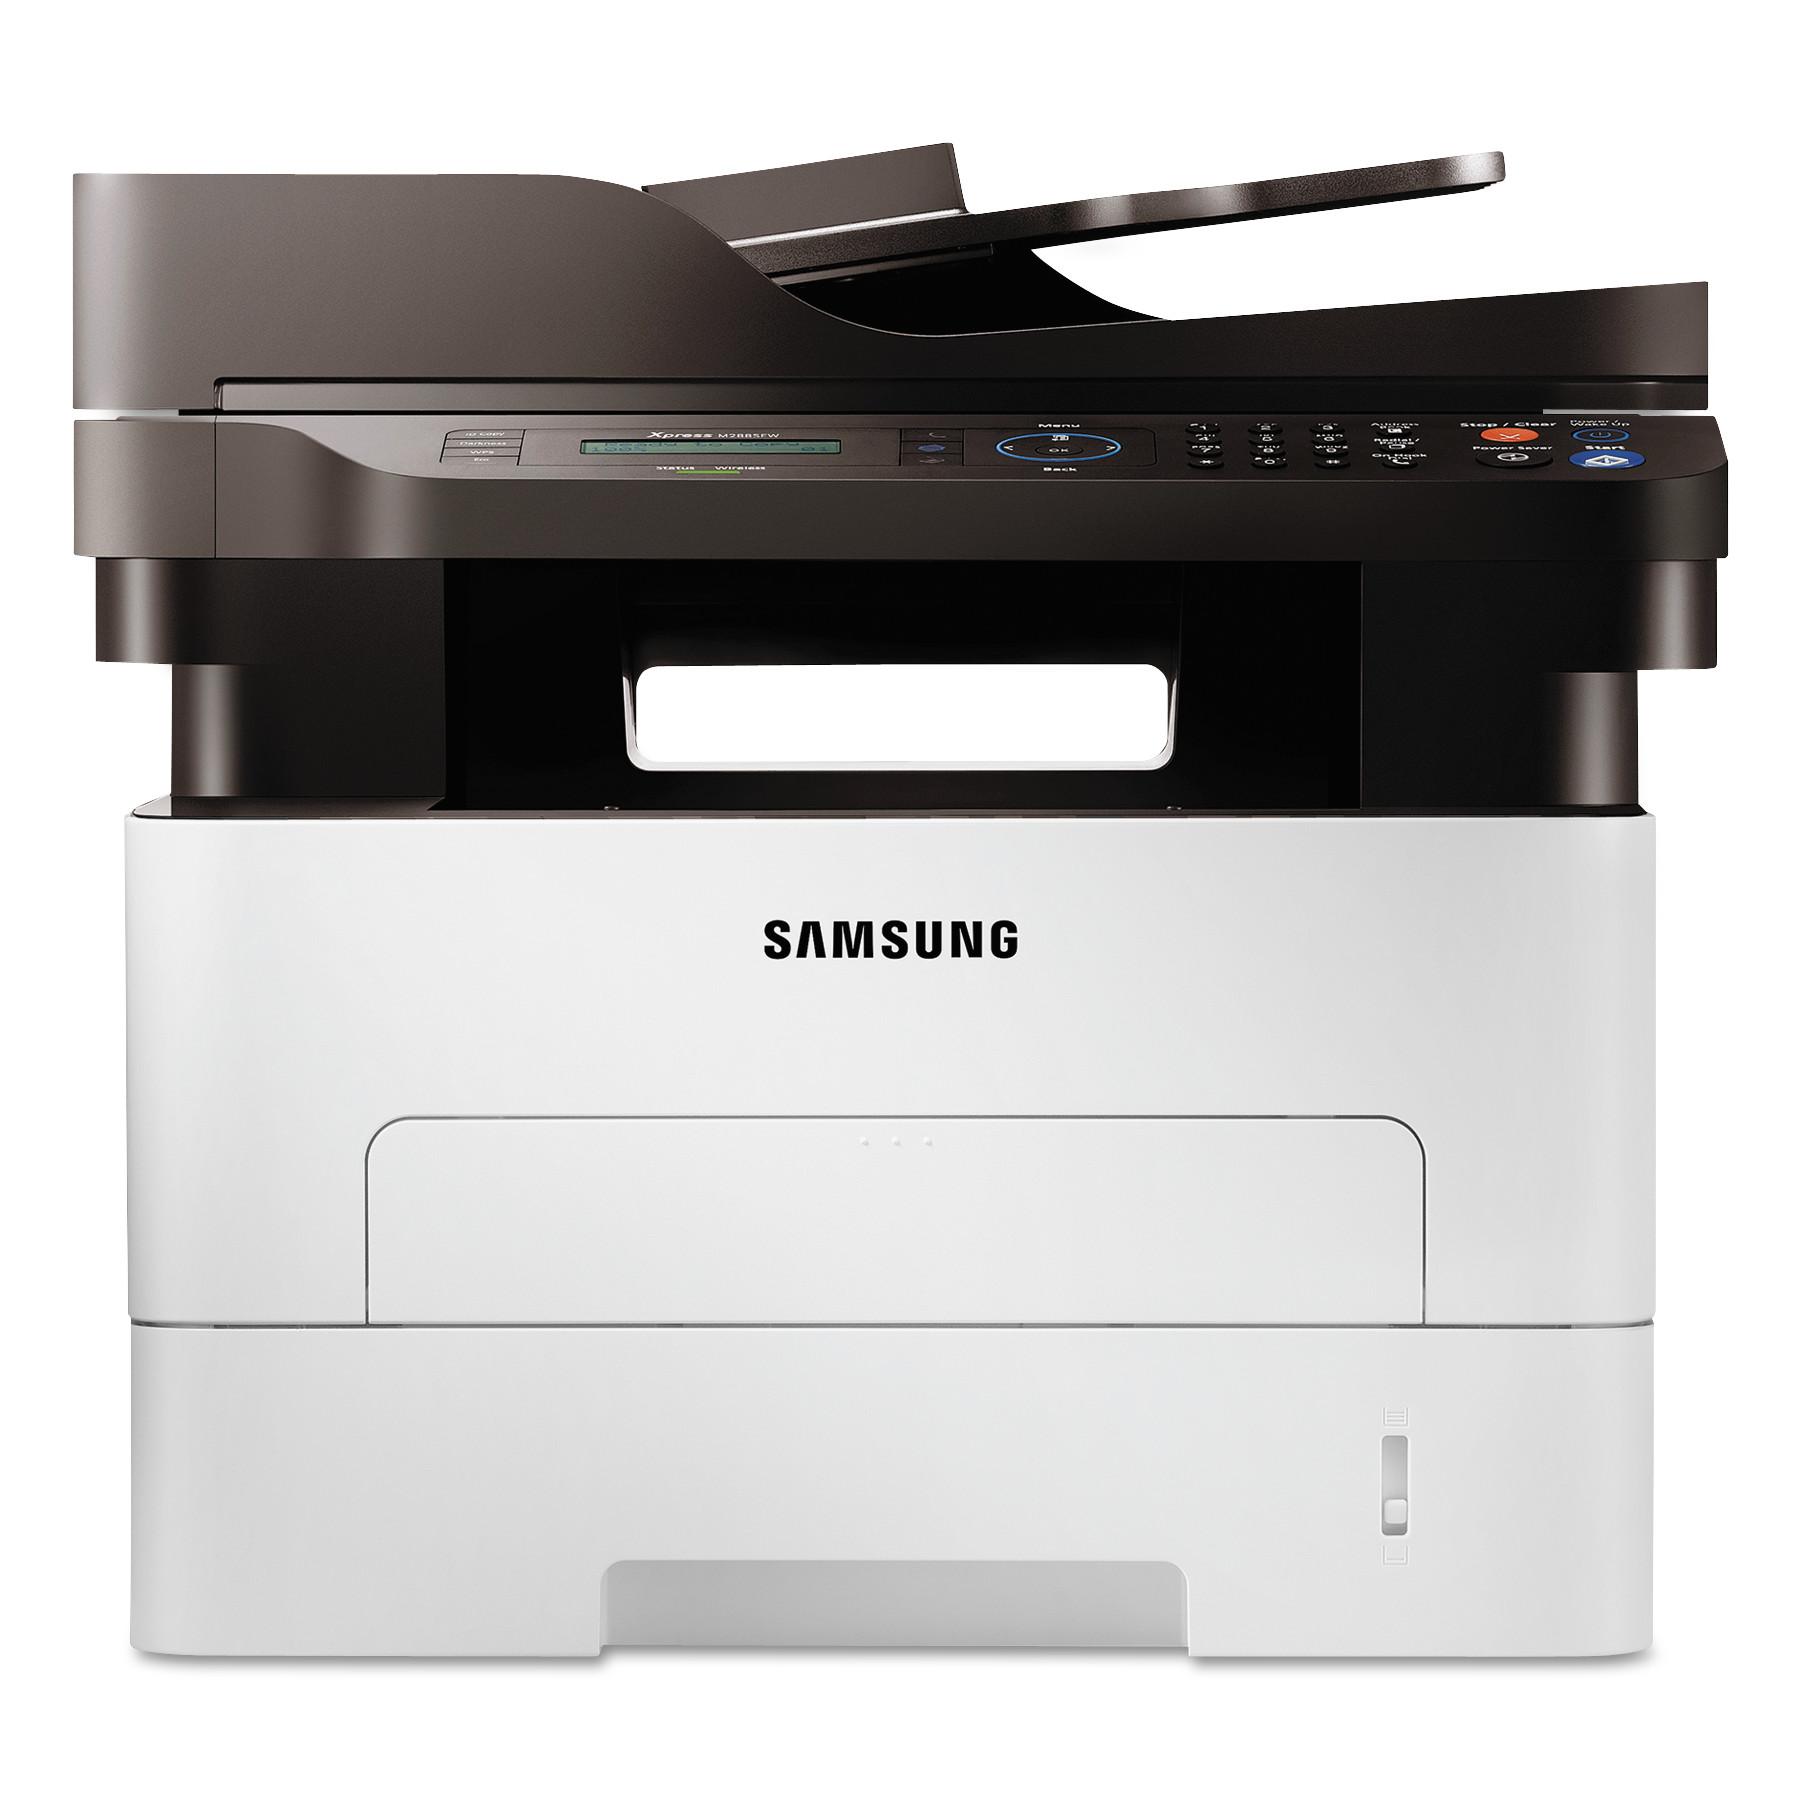 Samsung SL-M2885FW Multifunction Laser Printer, Copy/Fax/Print/Scan